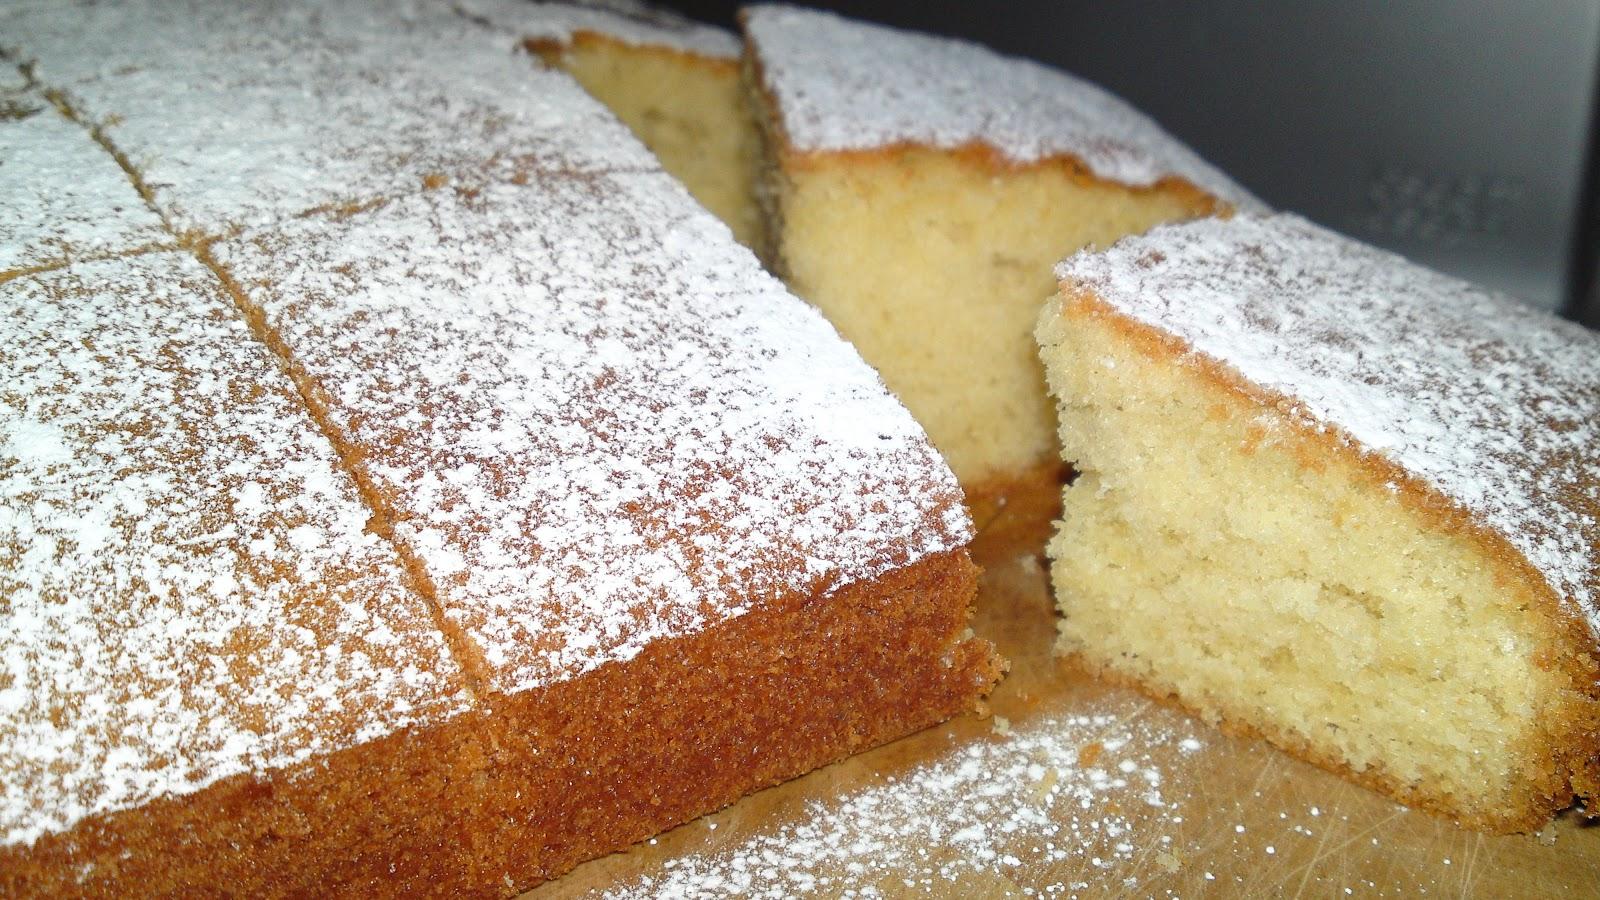 All In One Sponge Cake Tray Bake